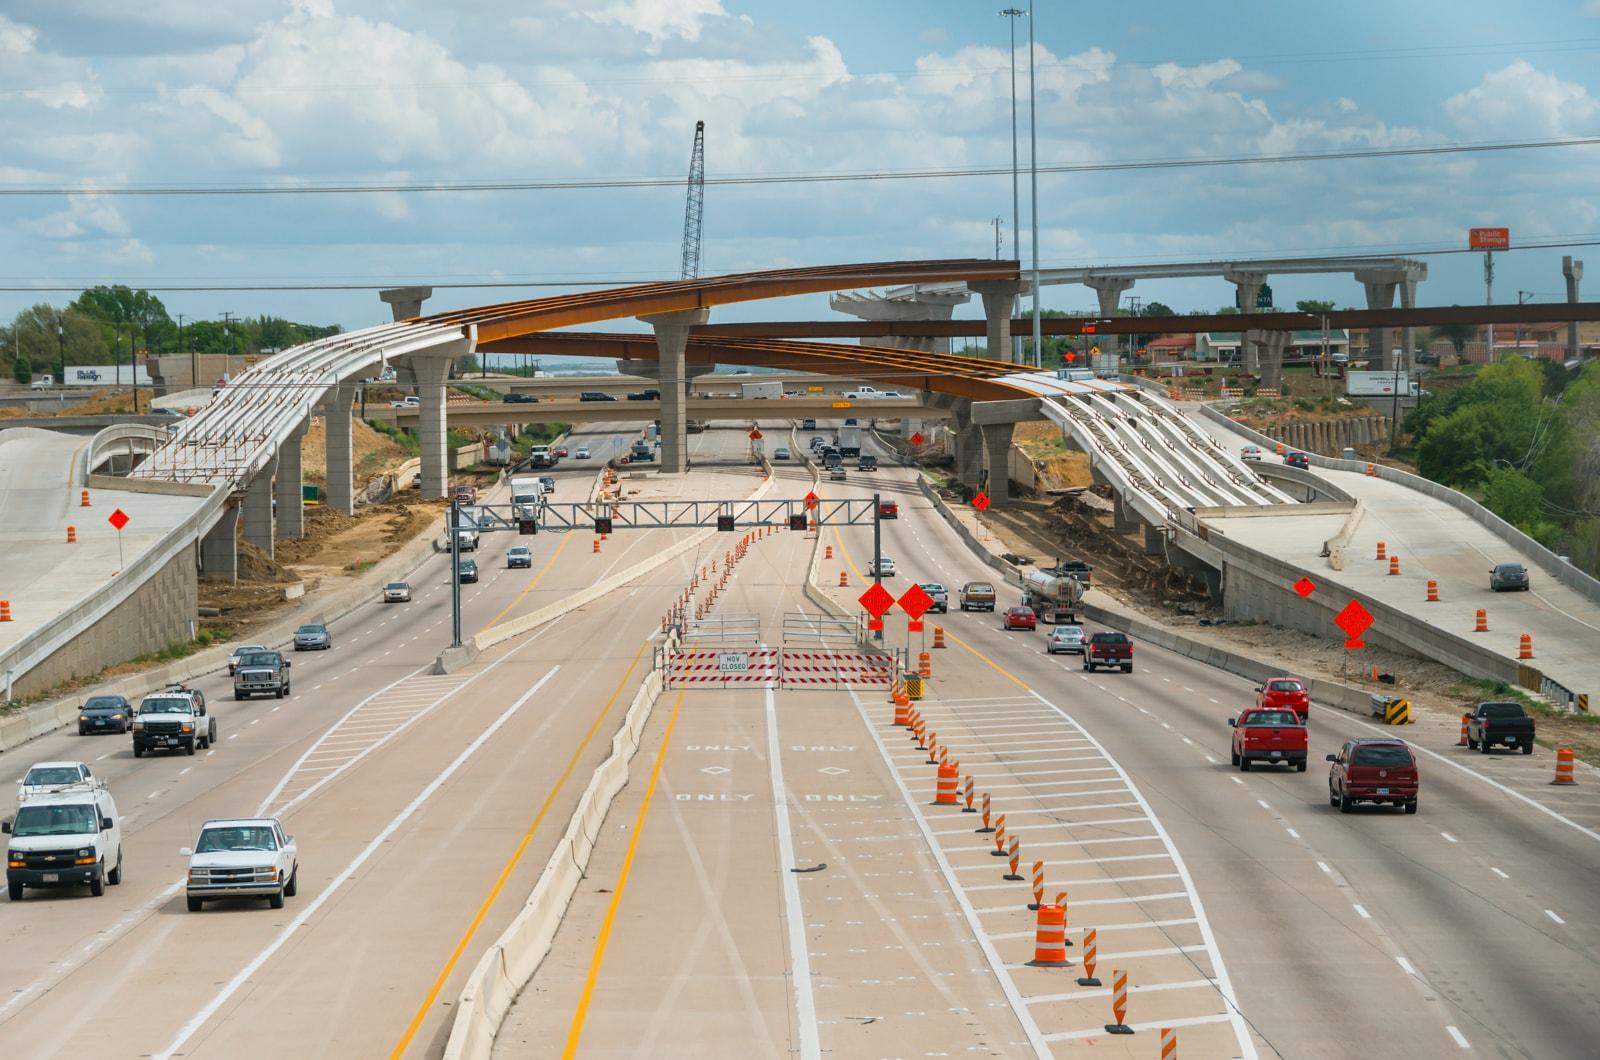 Massive highway bridges under construction